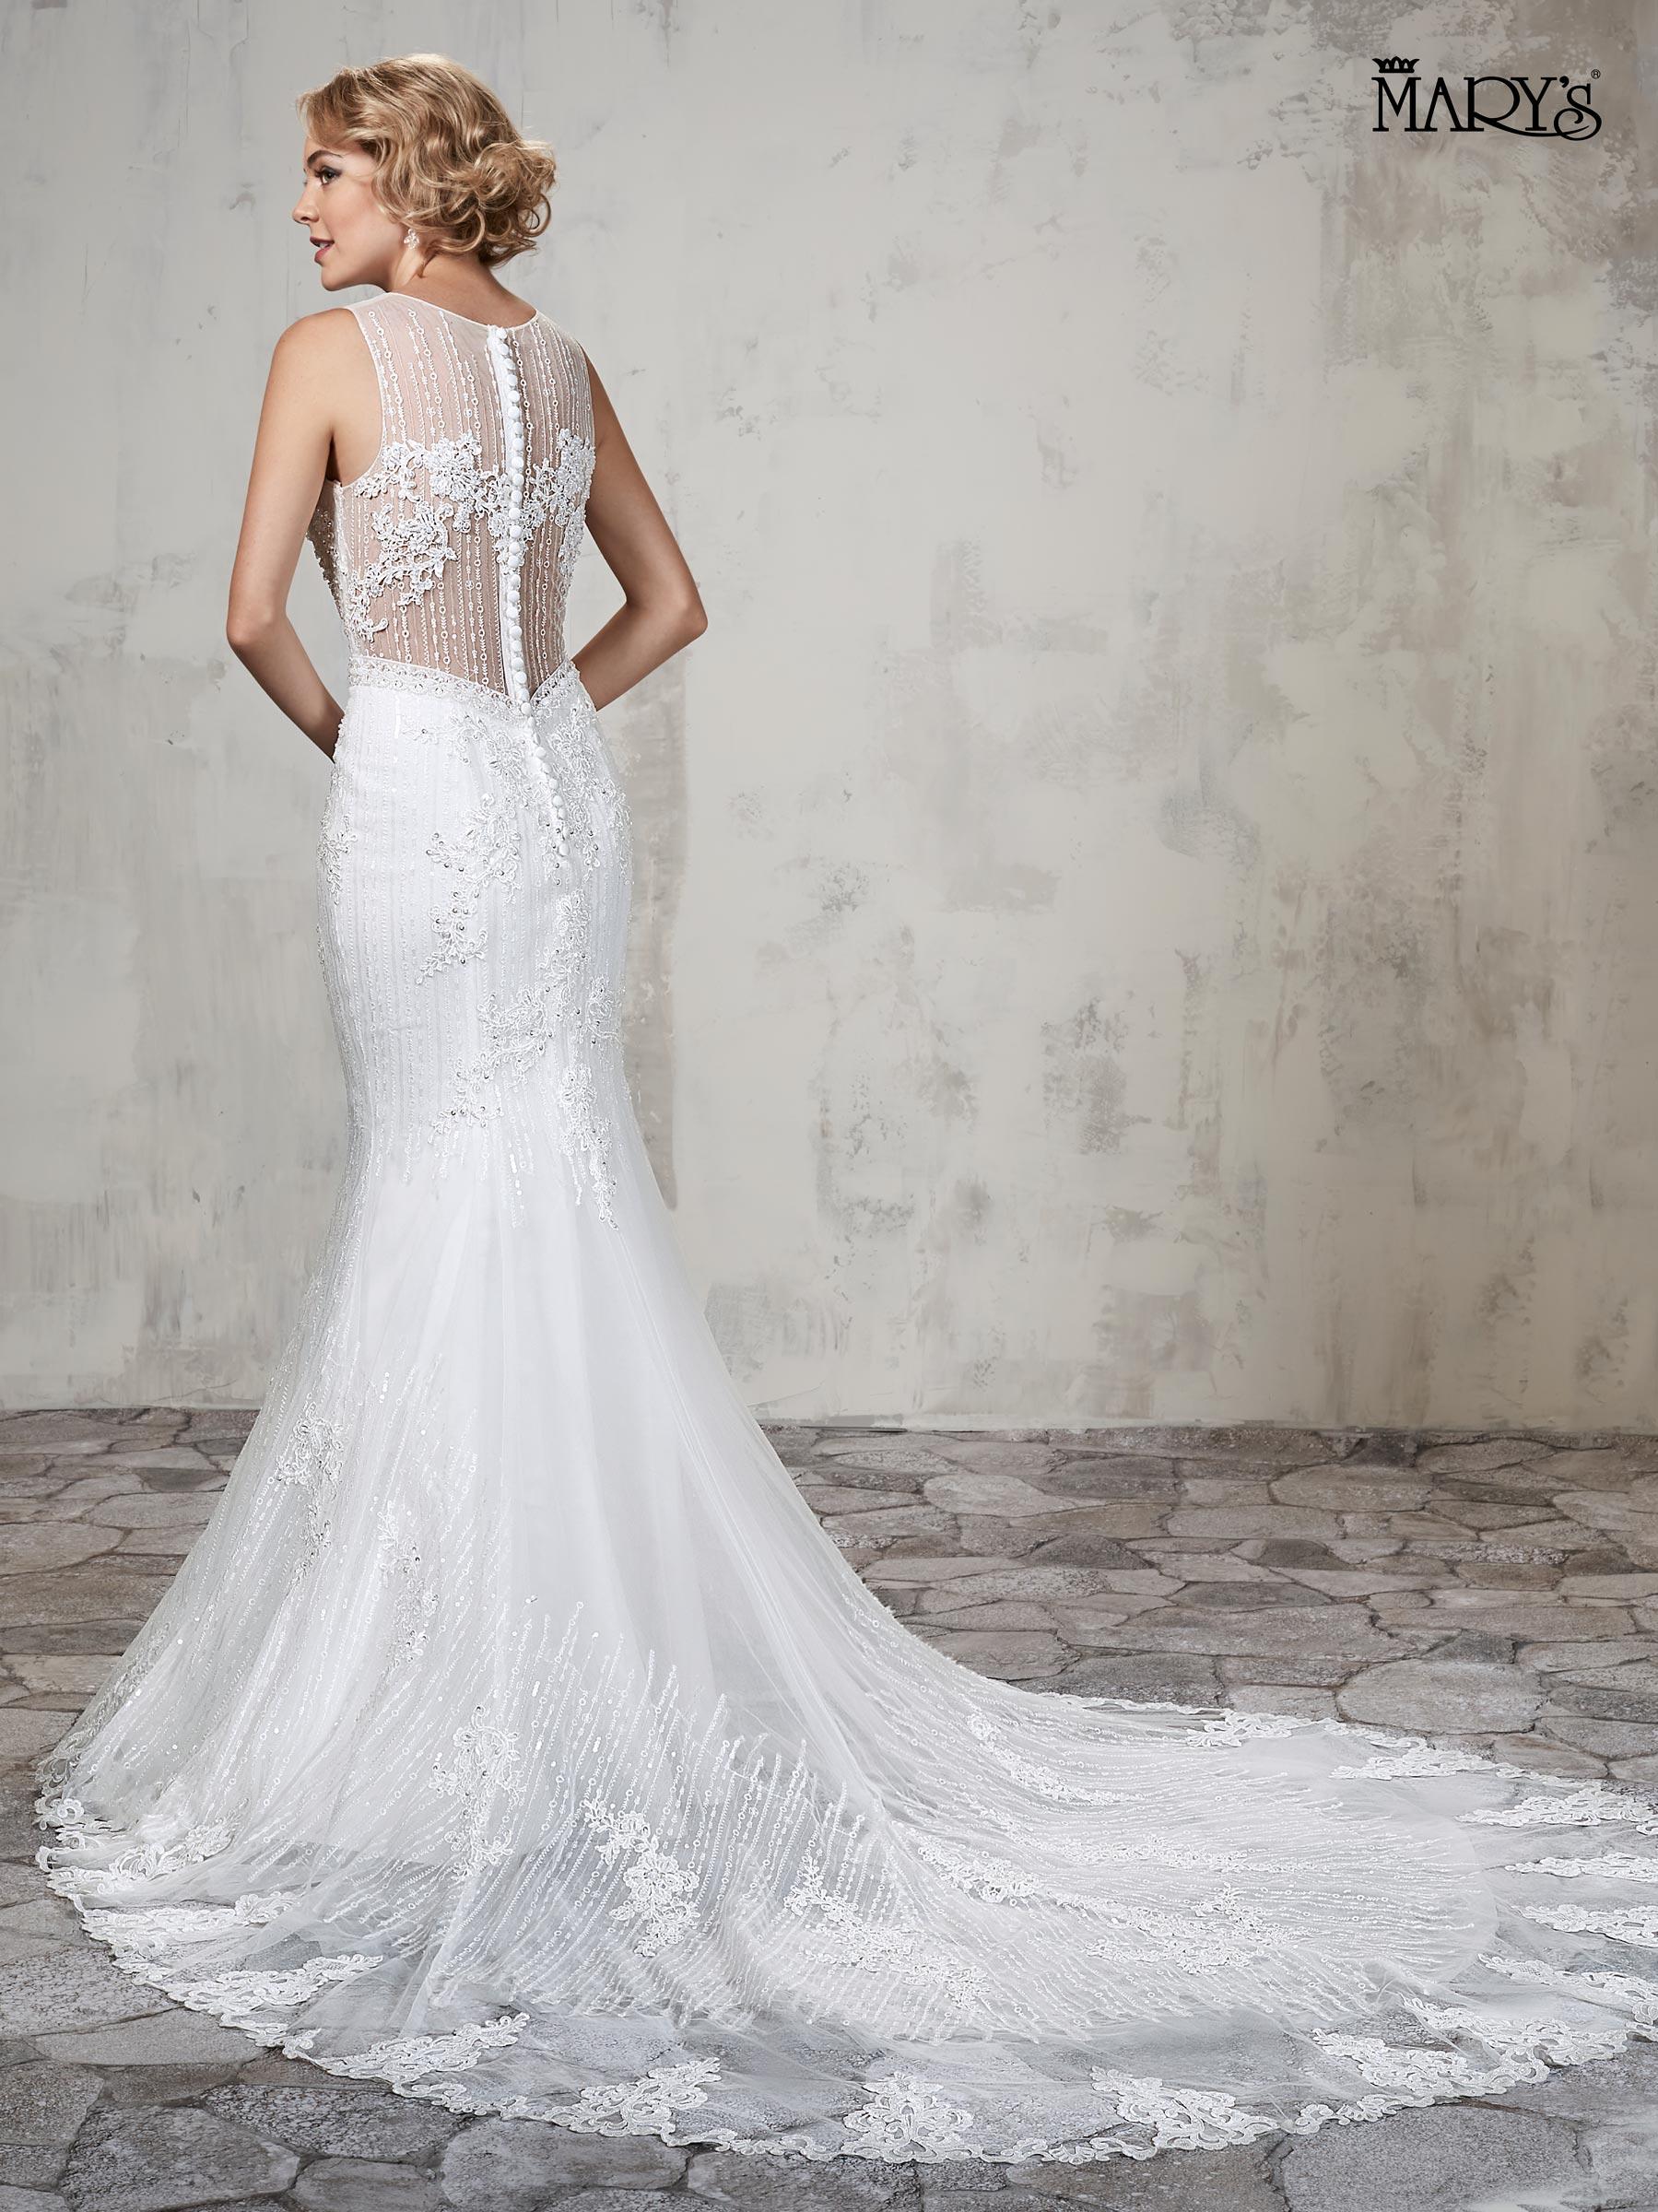 Bridal Wedding Dresses | Mary's | Style - MB3001